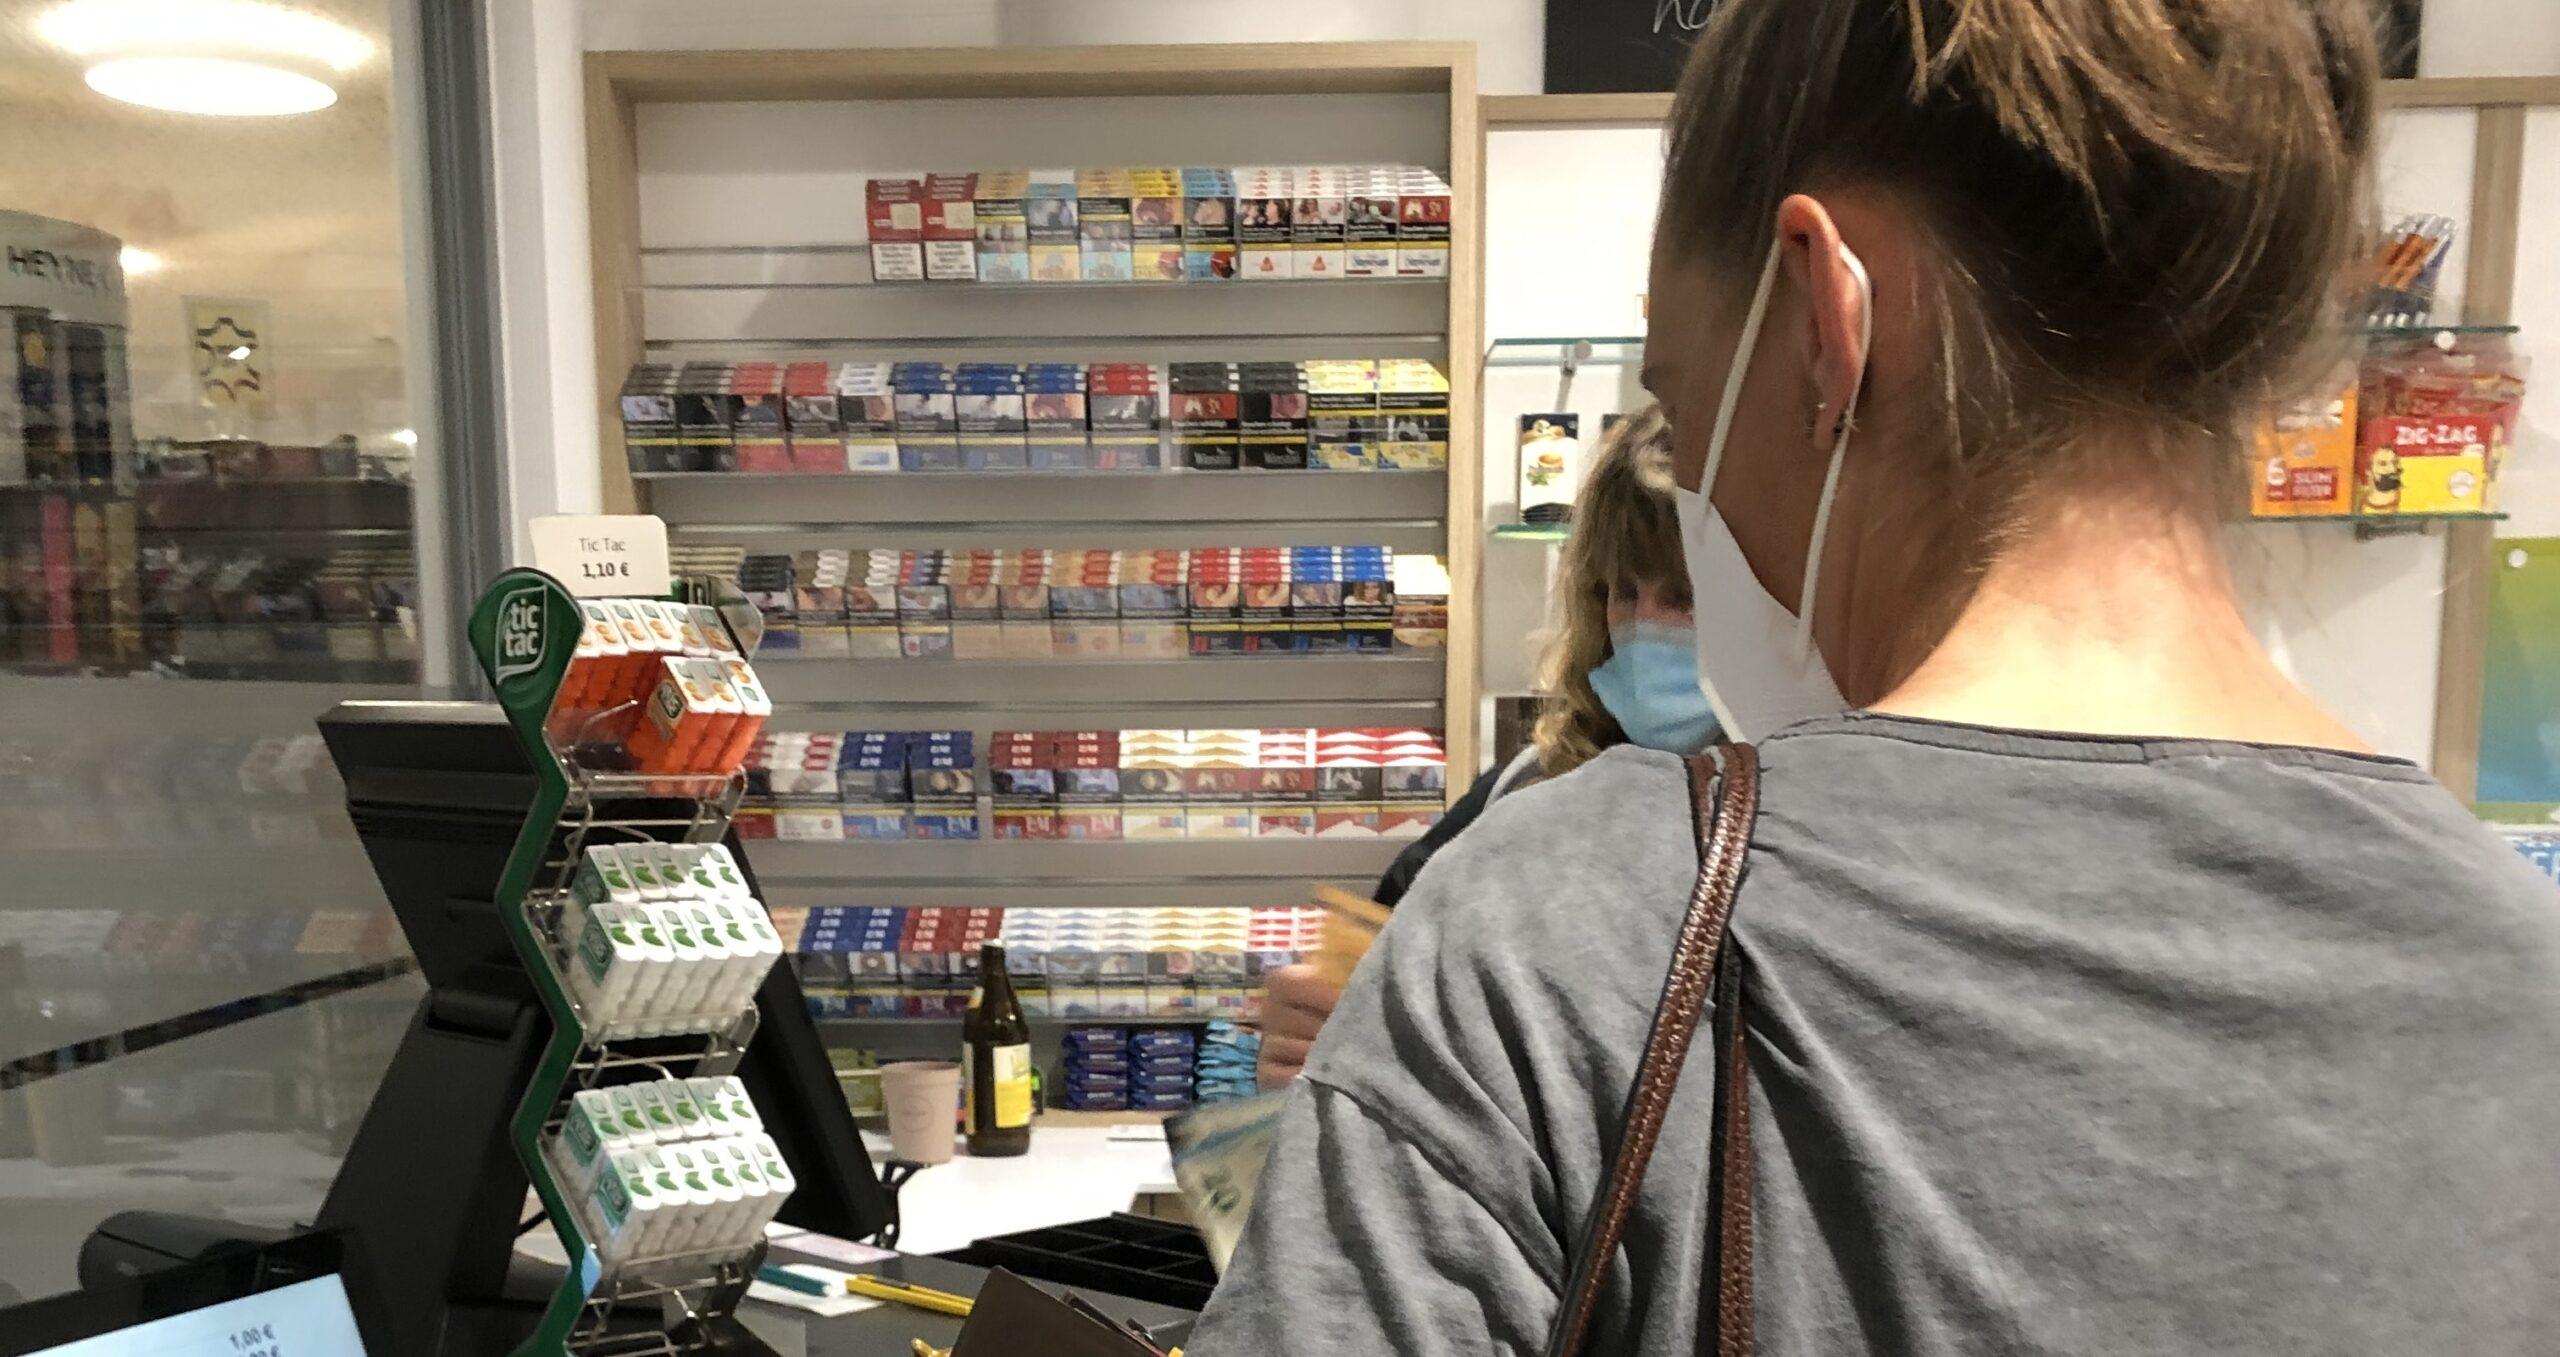 Stoppt den Verkauf von Tabakwaren im Krankenhaus